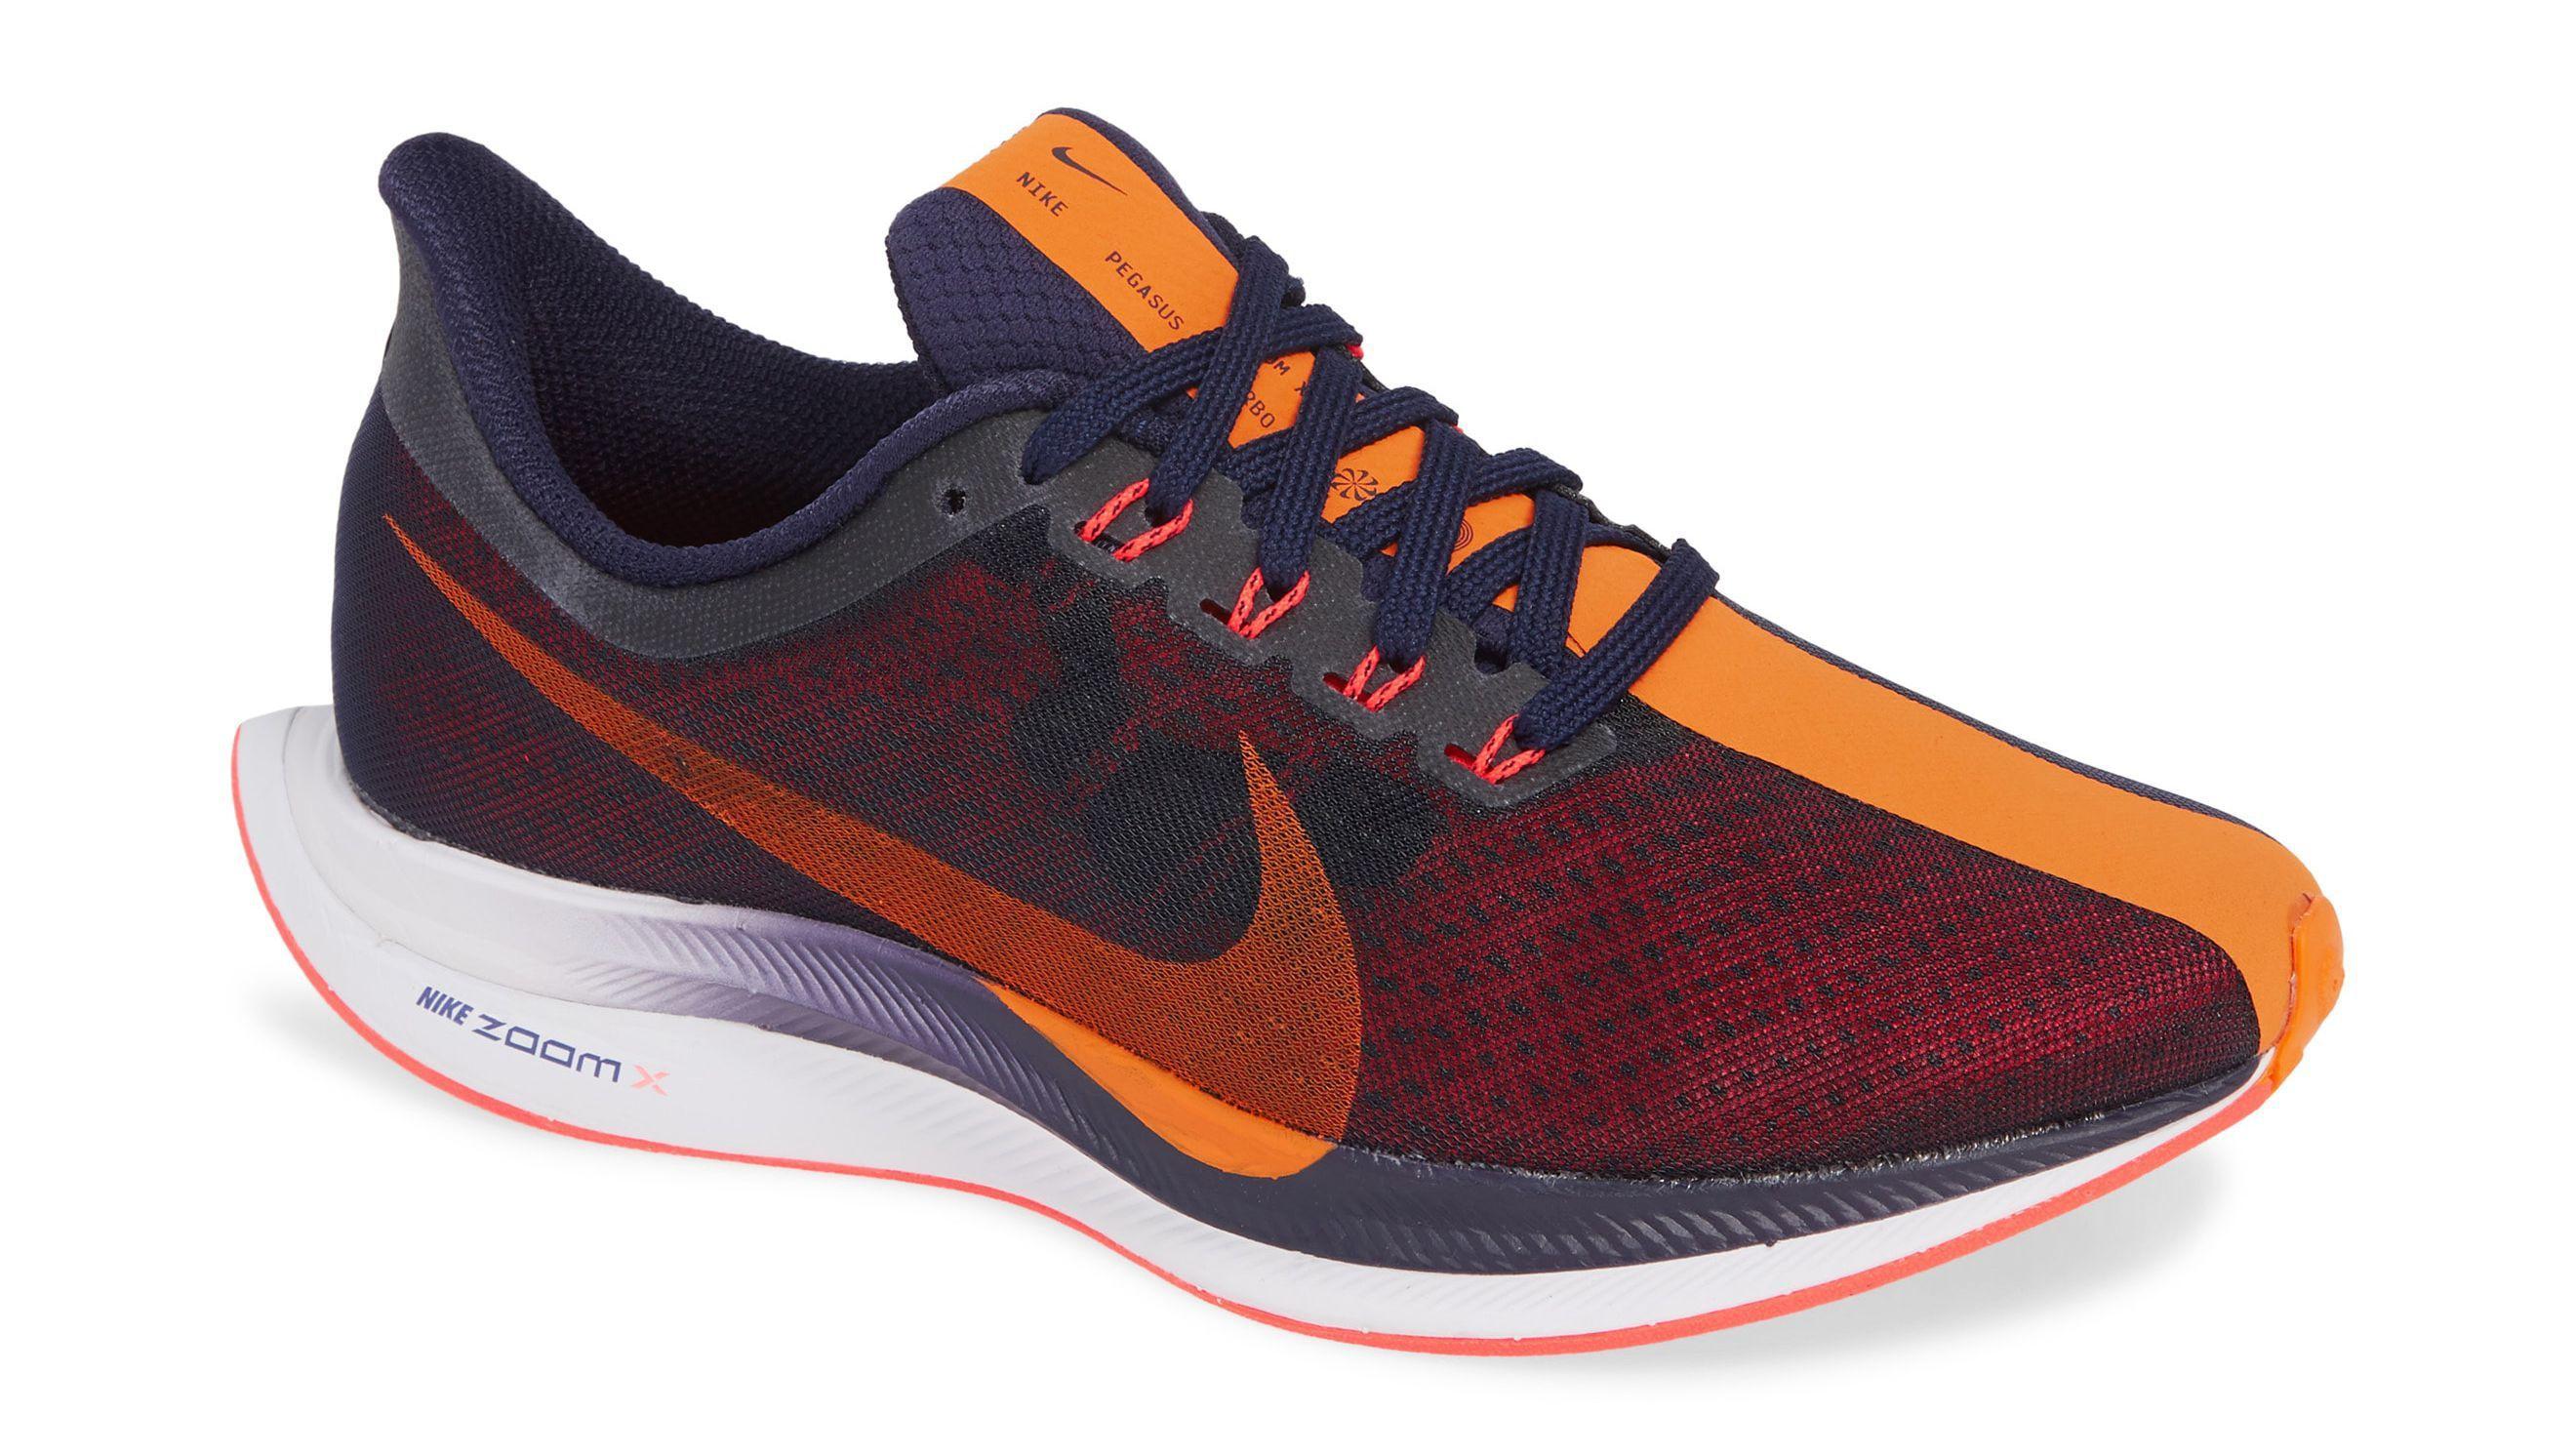 da80bf545d1 Best for Everyday Speed  Nike Zoom Pegasus Turbo. Courtesy. Zoom Pegasus 35  Turbo Running Shoe